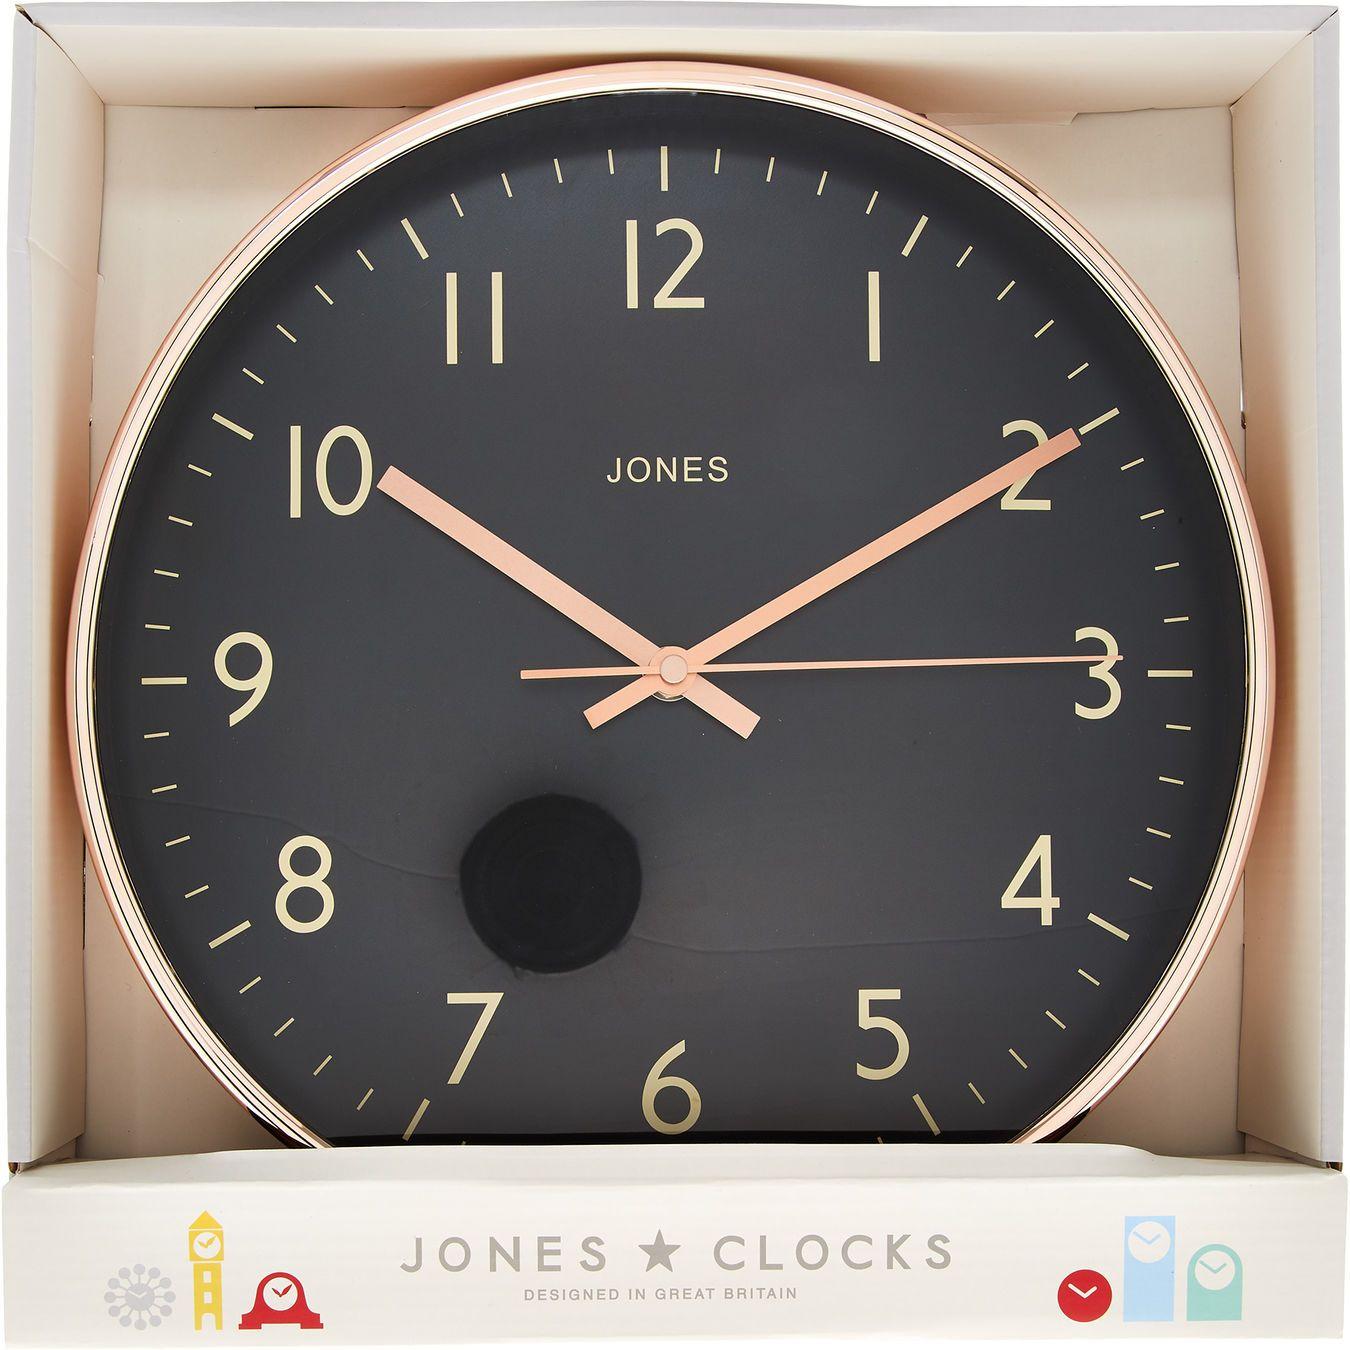 Black Copper Tone Wall Clock Clocks Home Accessories Home Tk Maxx Living Room